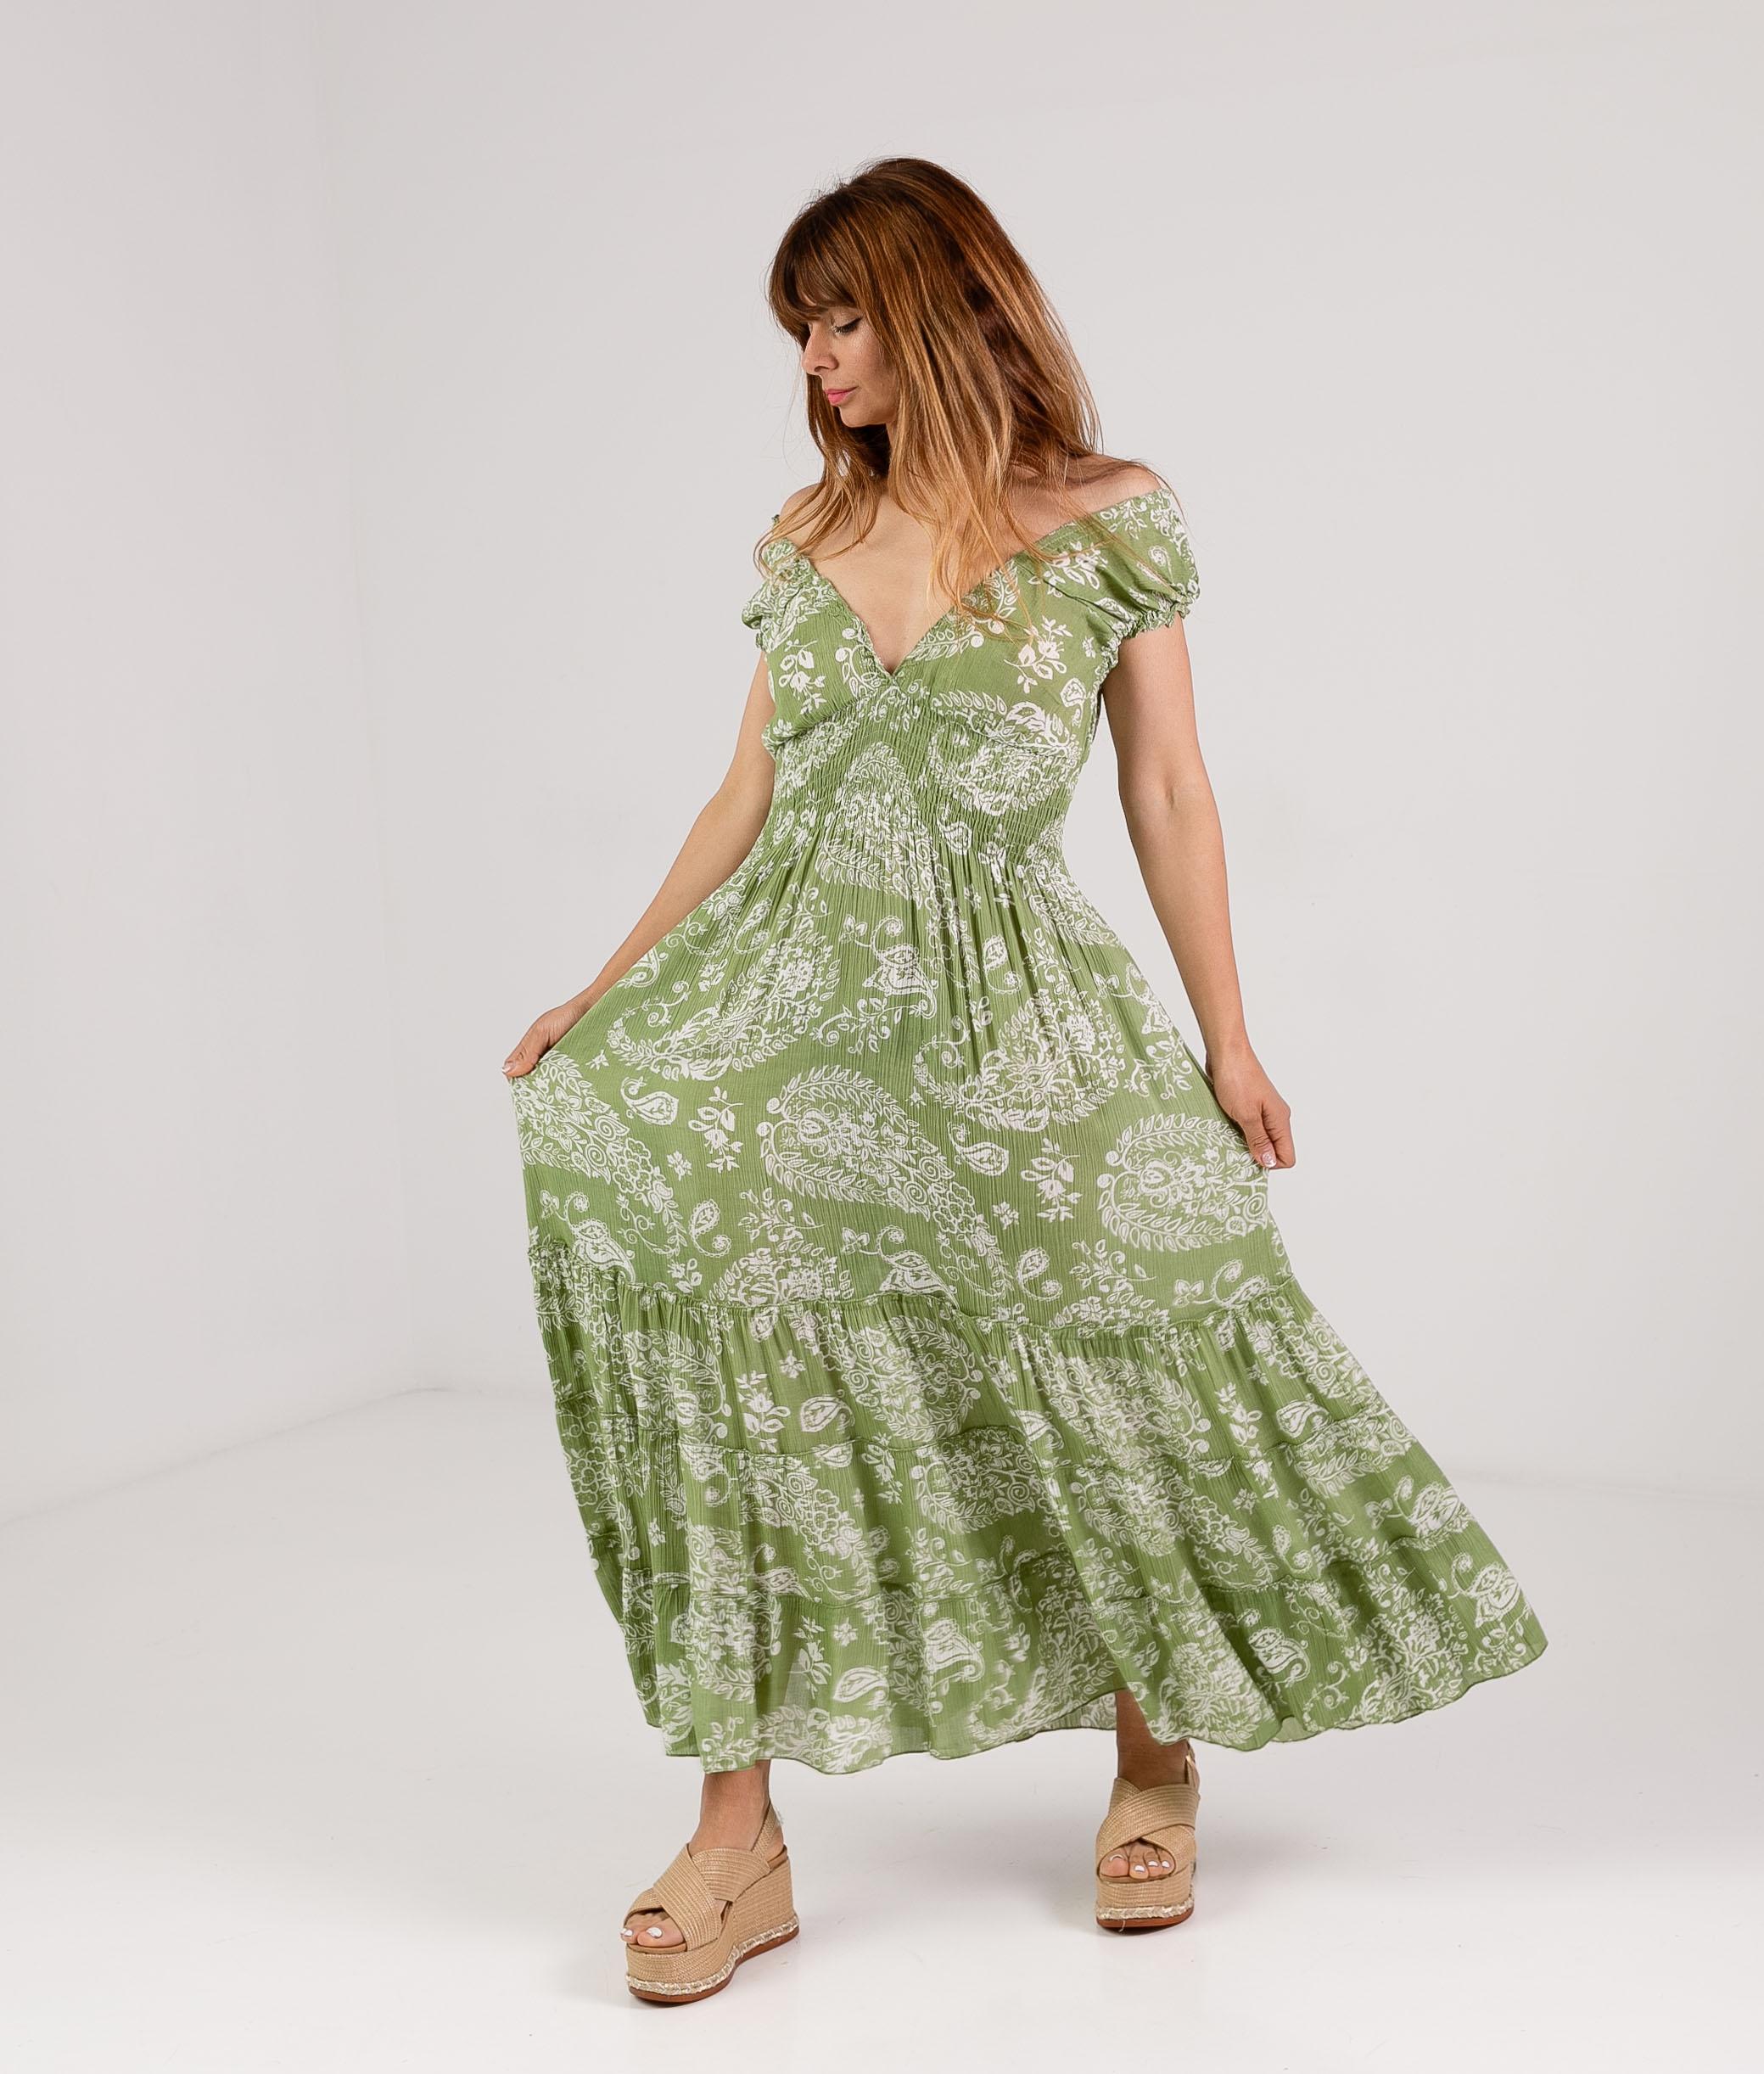 DRESS KILCRE - GREEN